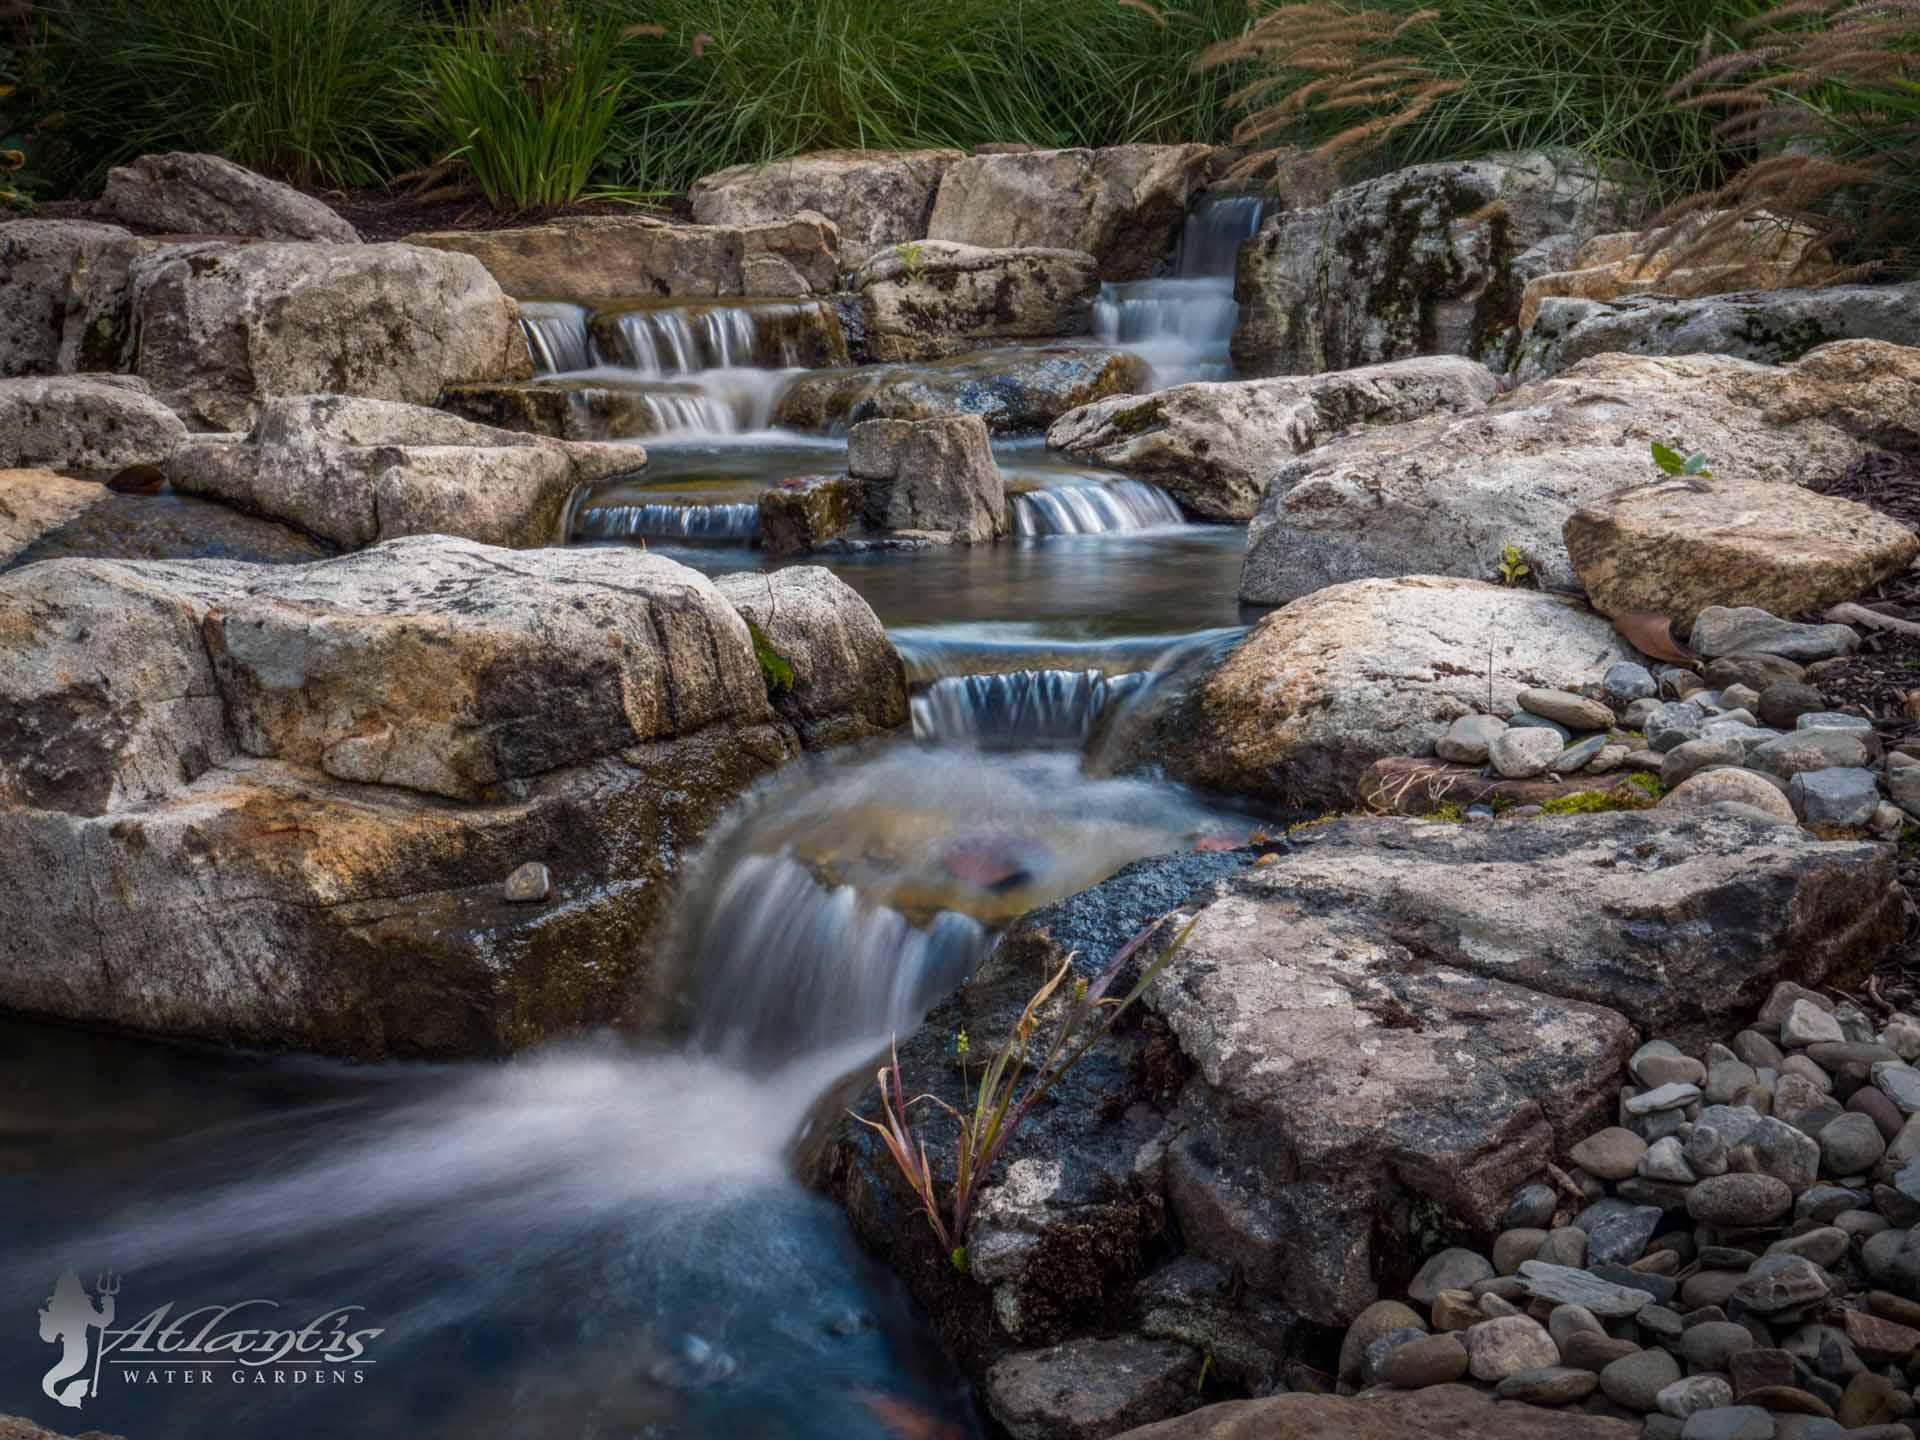 Pondless Waterfall by Atlantis Water Gardens Denville NJ